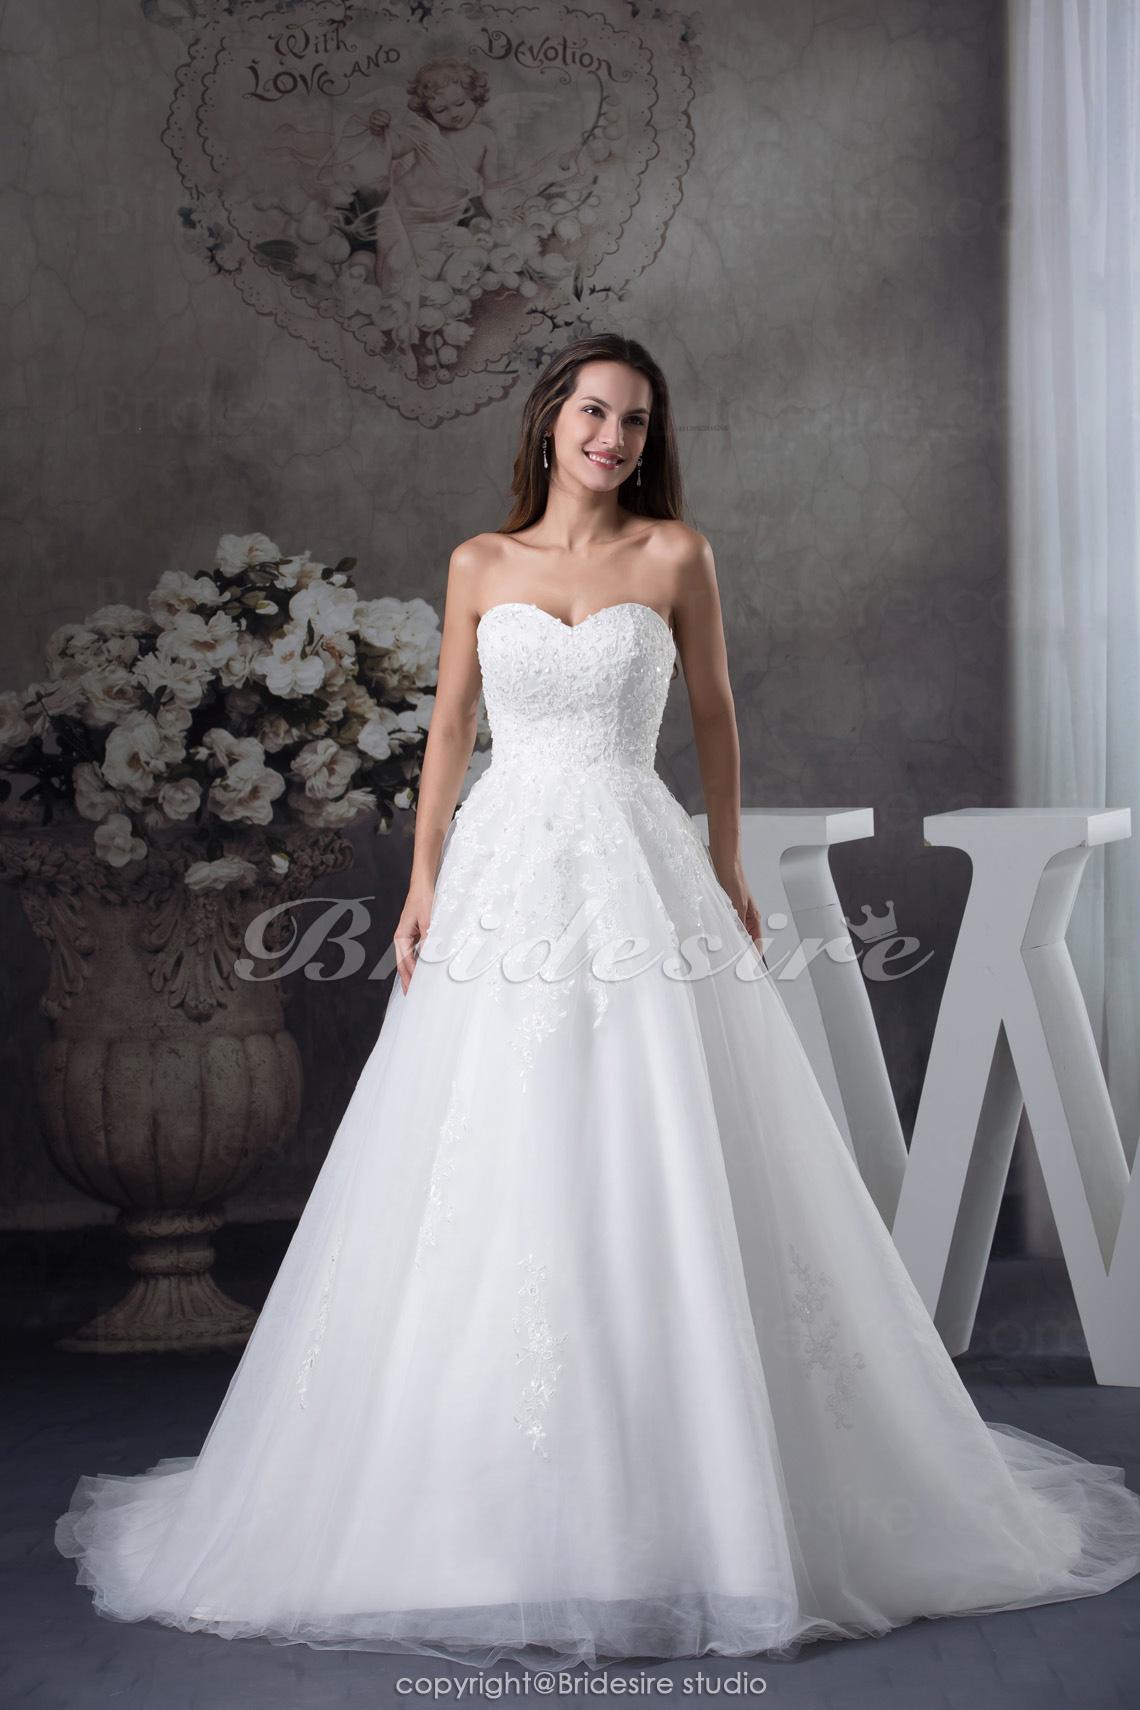 b6b71cfd Bridesire - A-linje Kæreste Kapel Tog Ærmeløs Organza Brudekjole [BDH1229]  - DKK1,502.27 : Bridesire